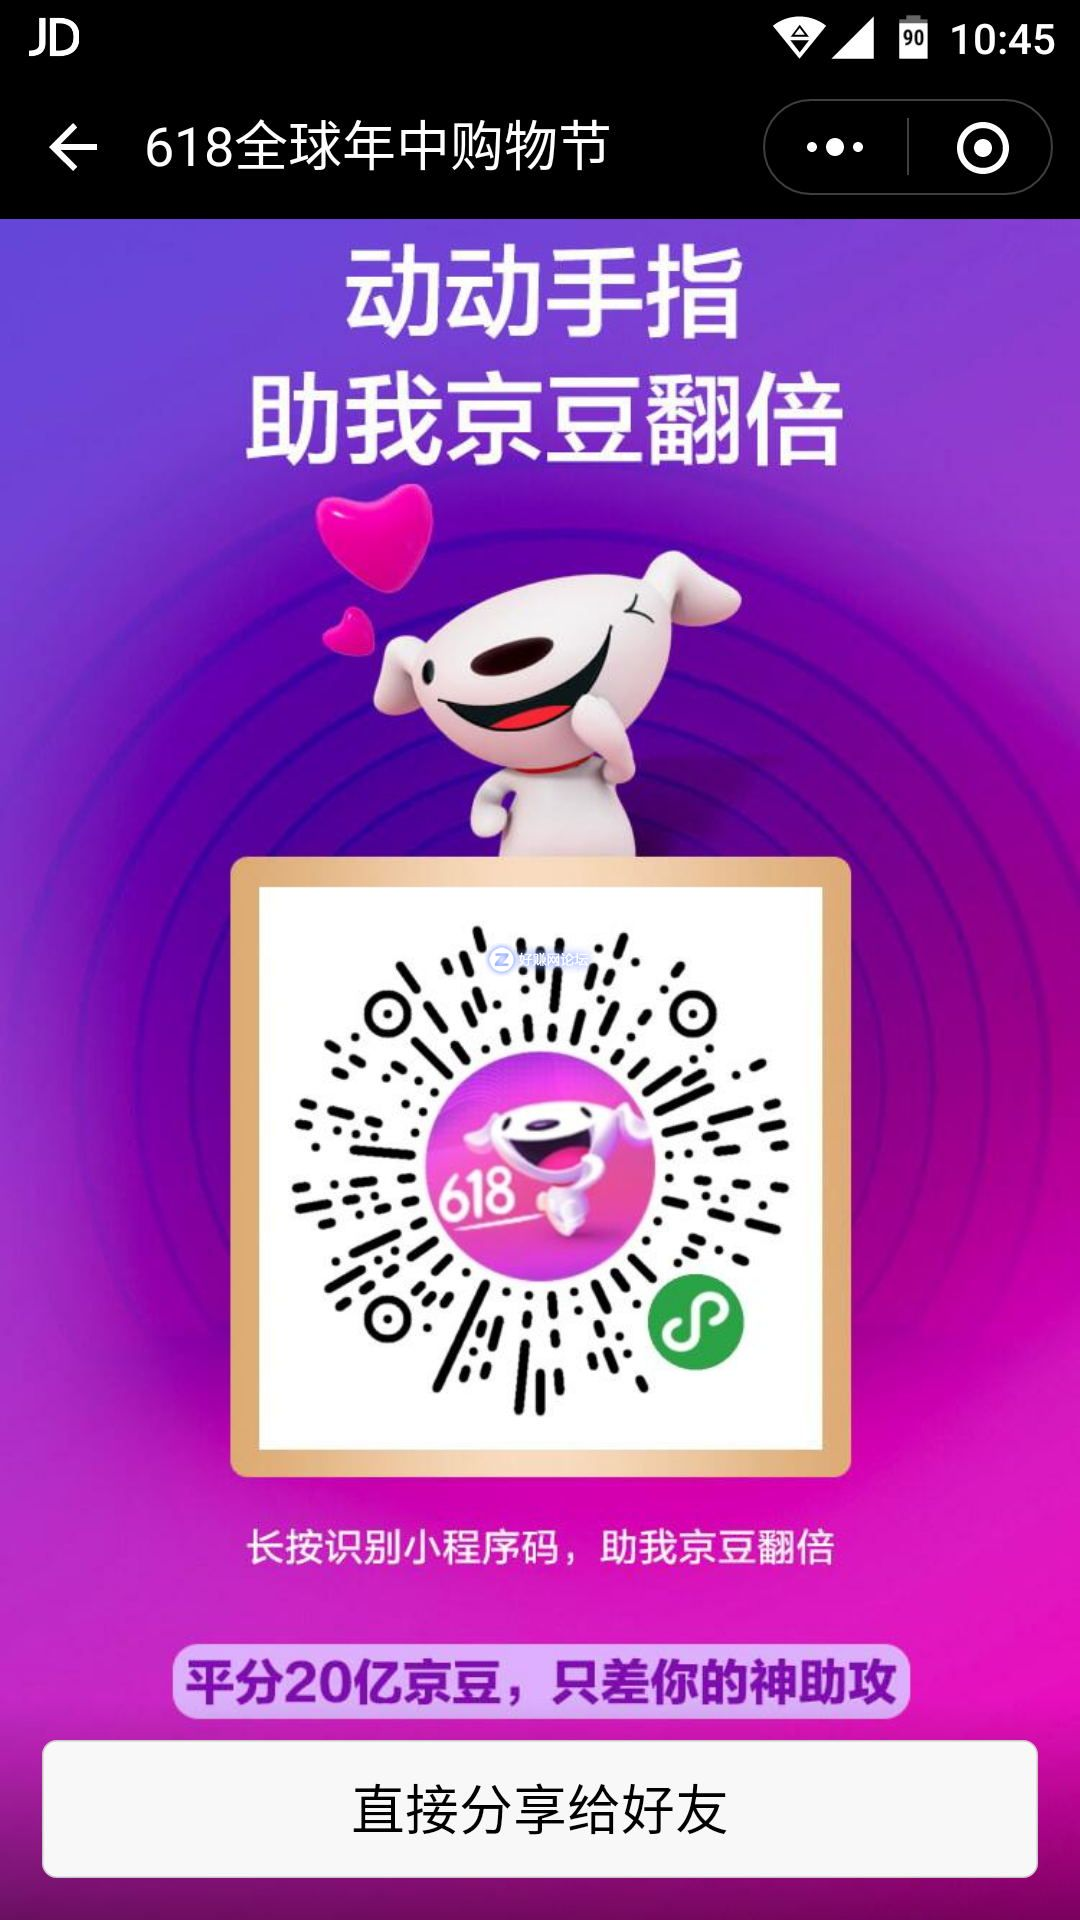 QQ图片20180612104951_看图王.jpg